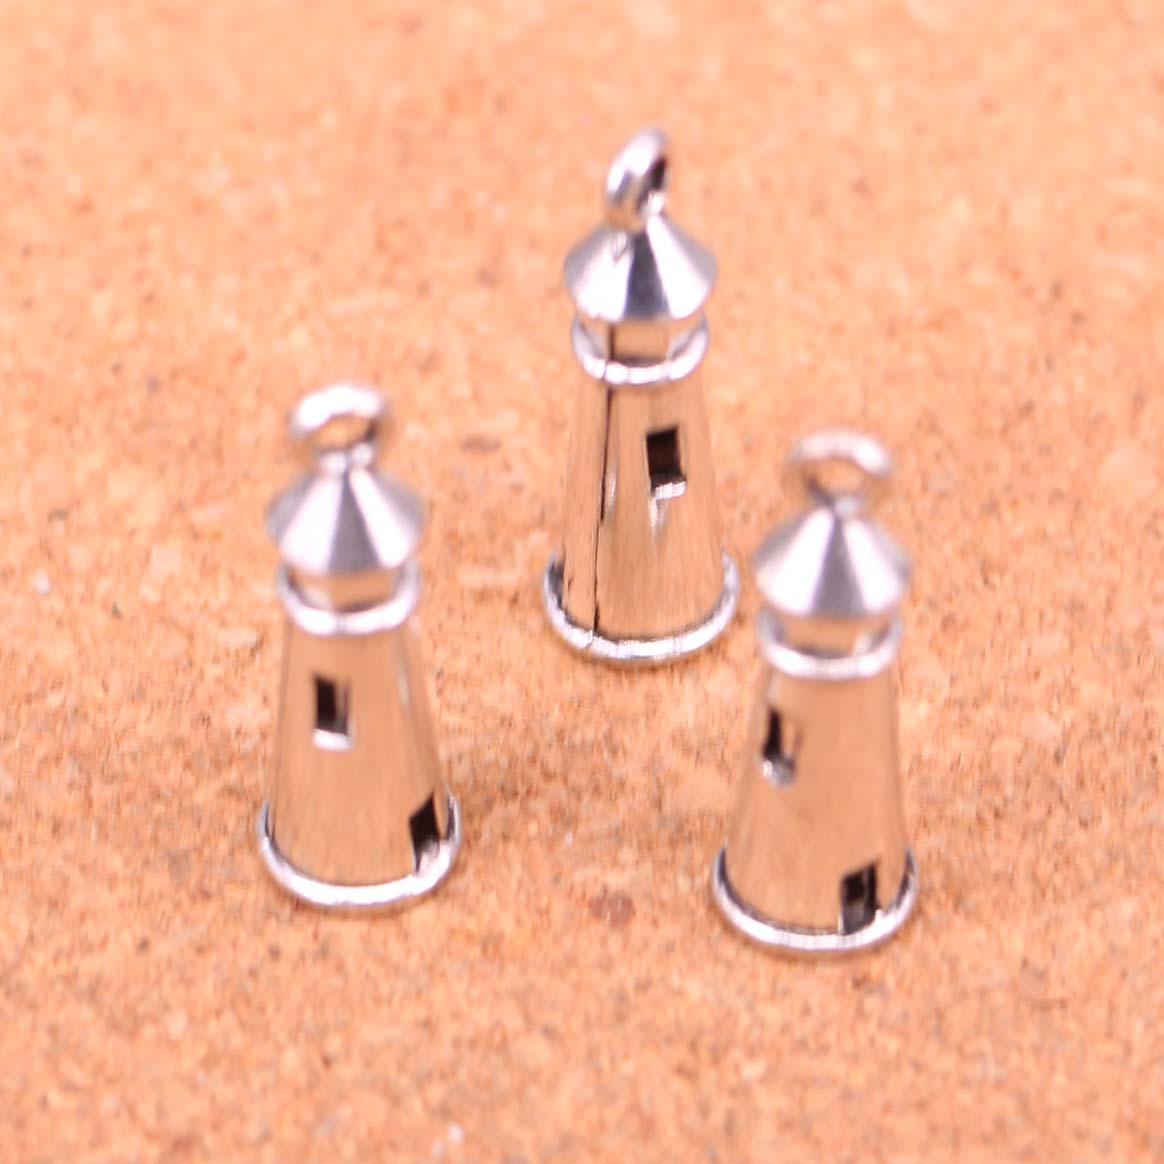 10x Lighthouse Shaped Pendant Charms 10Pcs Tibetan Silver Beads 27*11mm